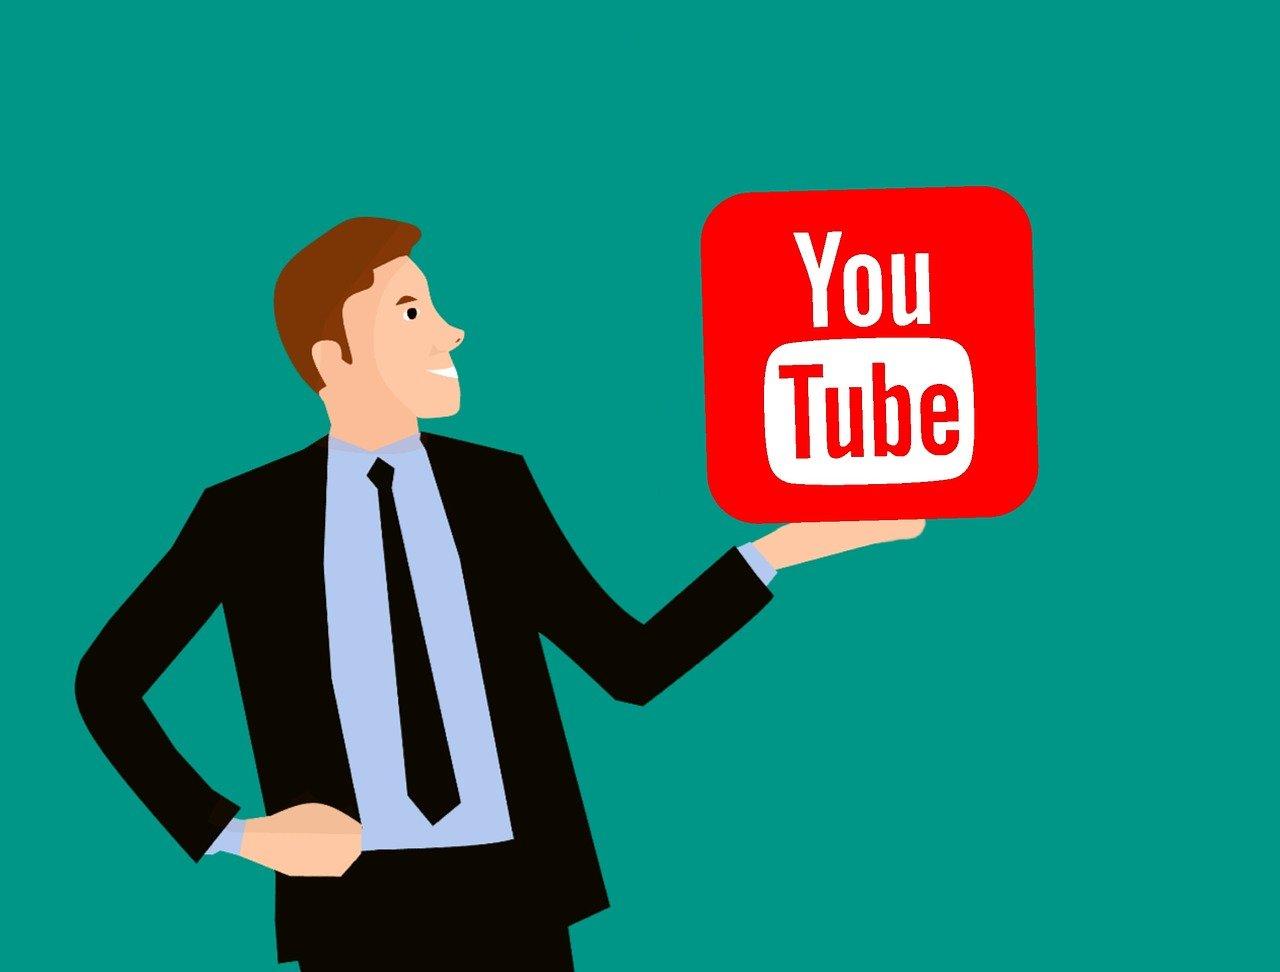 youtube, youtuber, channel-3157978.jpg